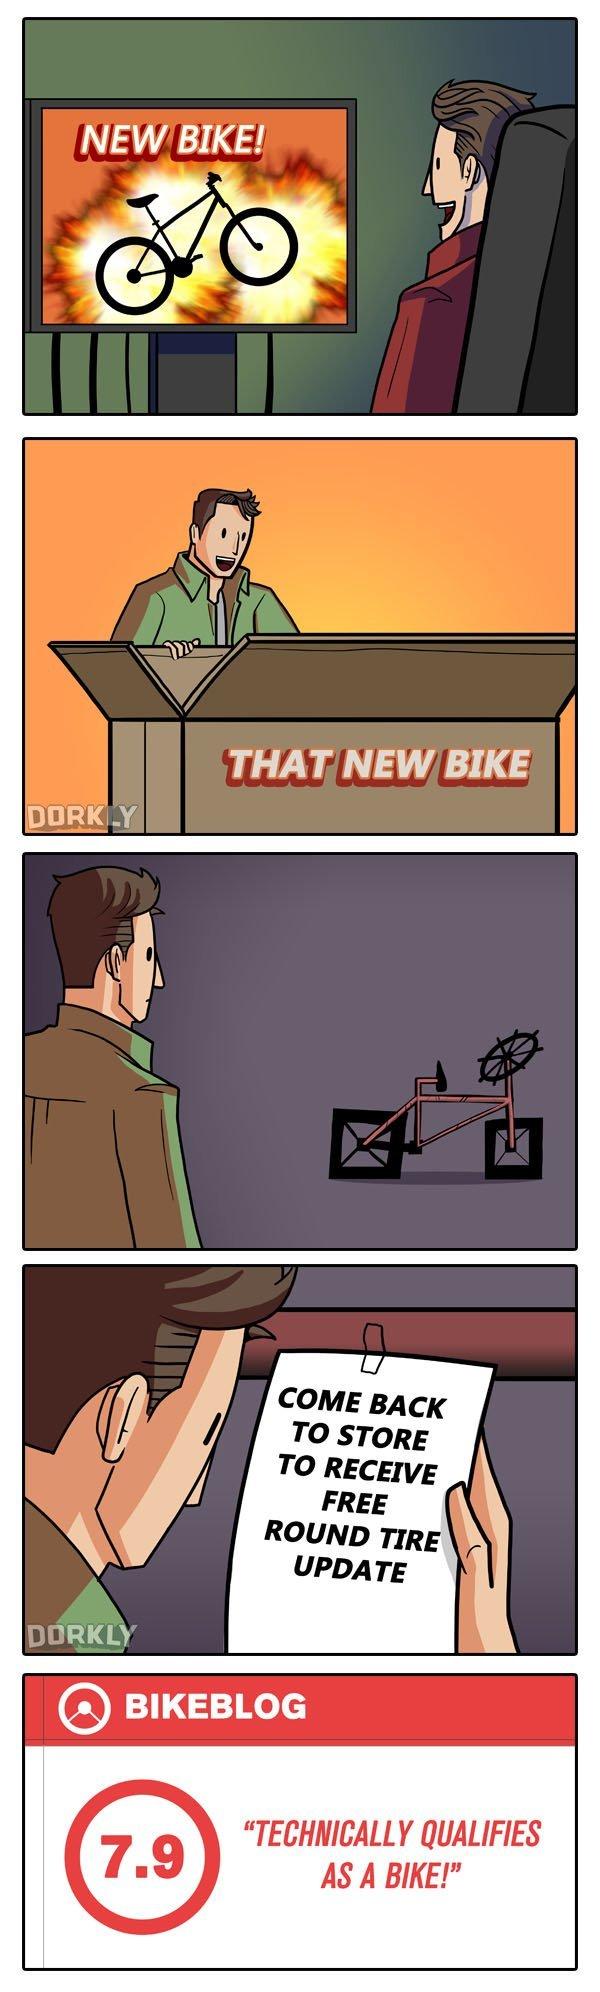 "Dorkly. Dorkly. NEW BIKE! Ily THAT NEW BIKE g QUALIFIES AS A BIKE!"". Dammit, EA"